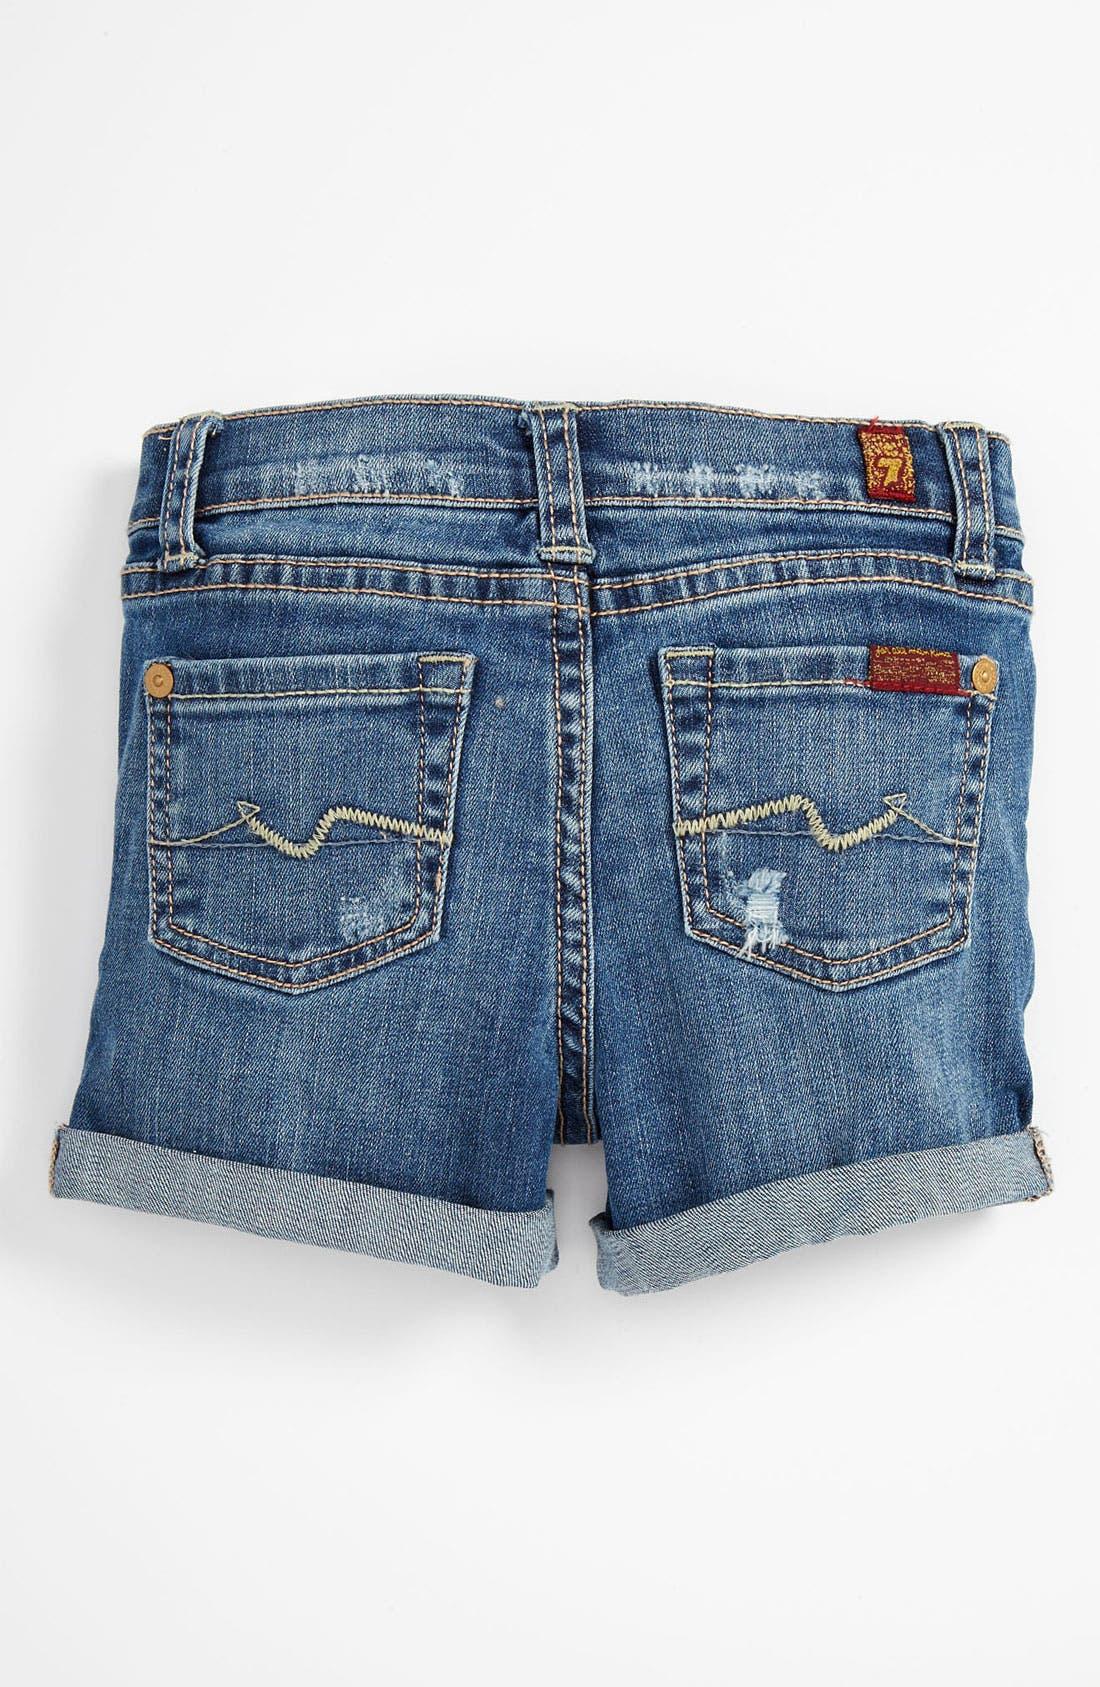 Alternate Image 1 Selected - 7 For All Mankind® Denim Shorts (Toddler)